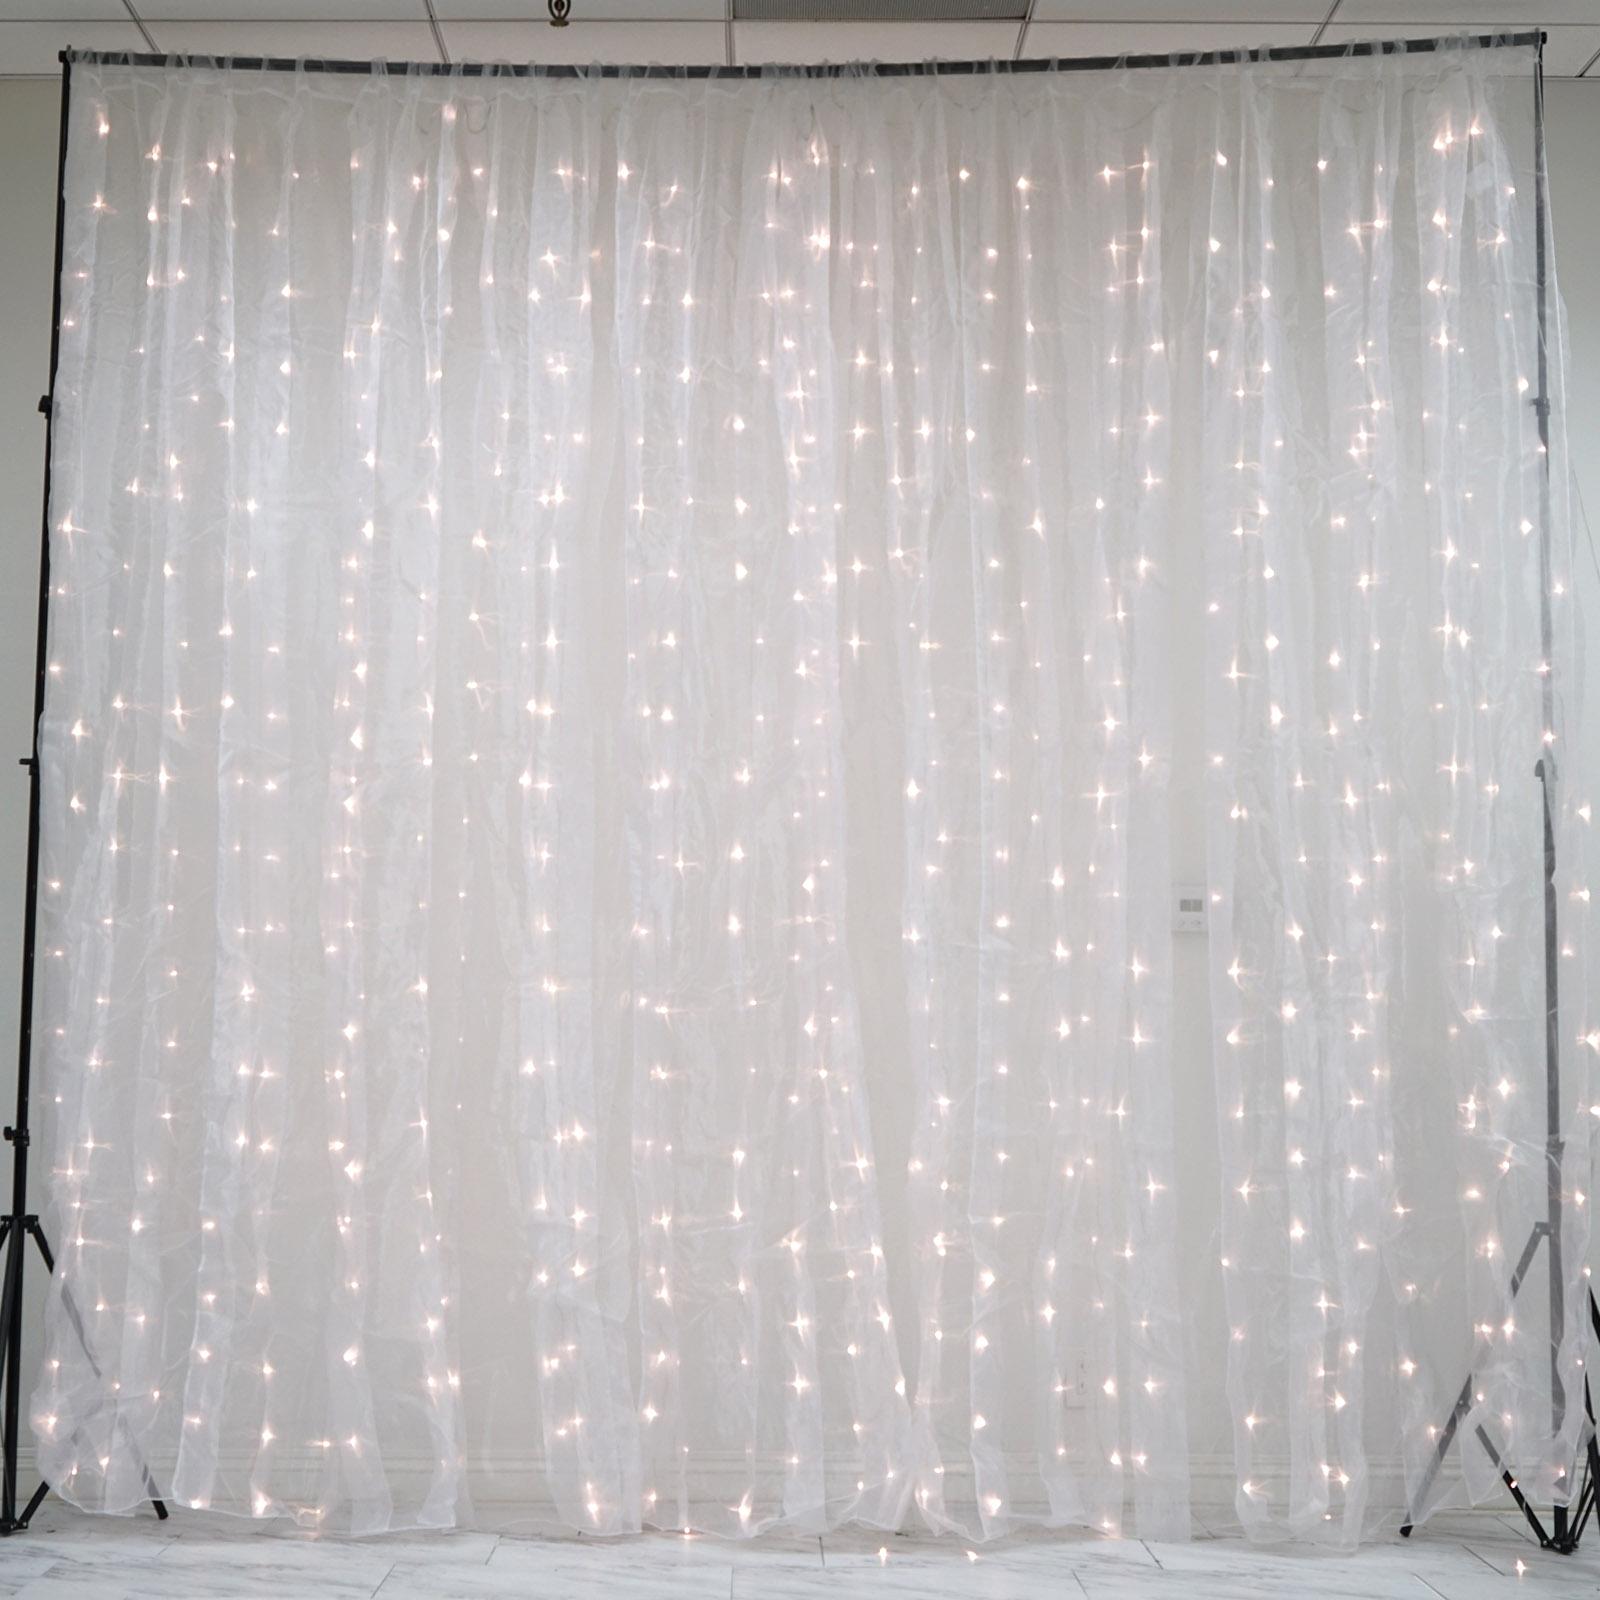 20ft X 10ft Led Lights Organza Backdrop Curtain Photobooth Wedding